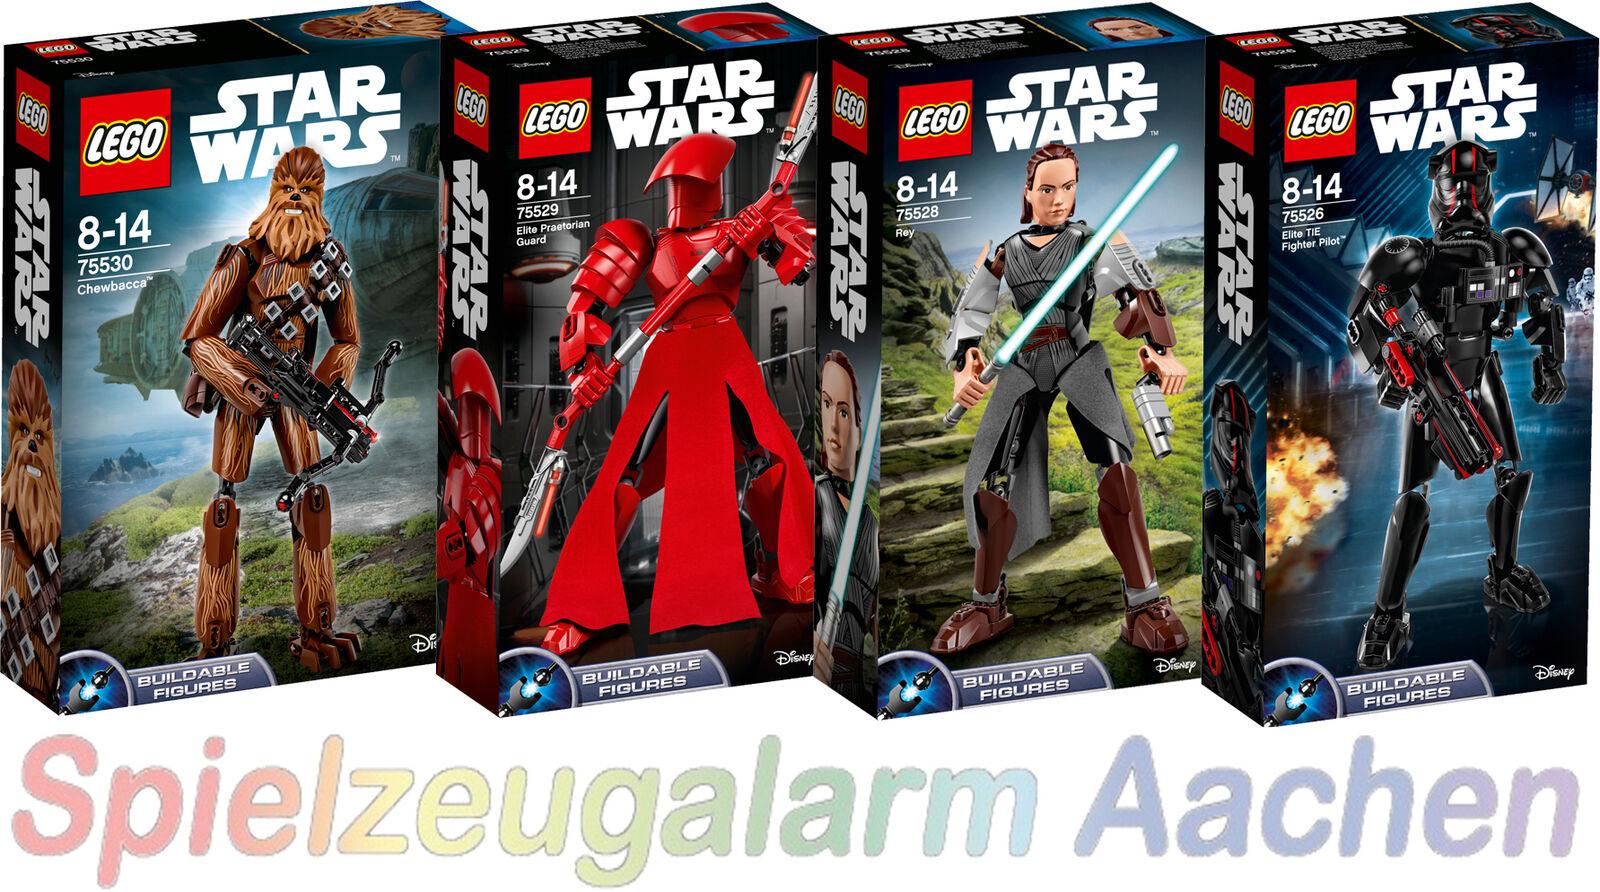 LEGO ® Star Wars Figures 75530+75529+75528+75526